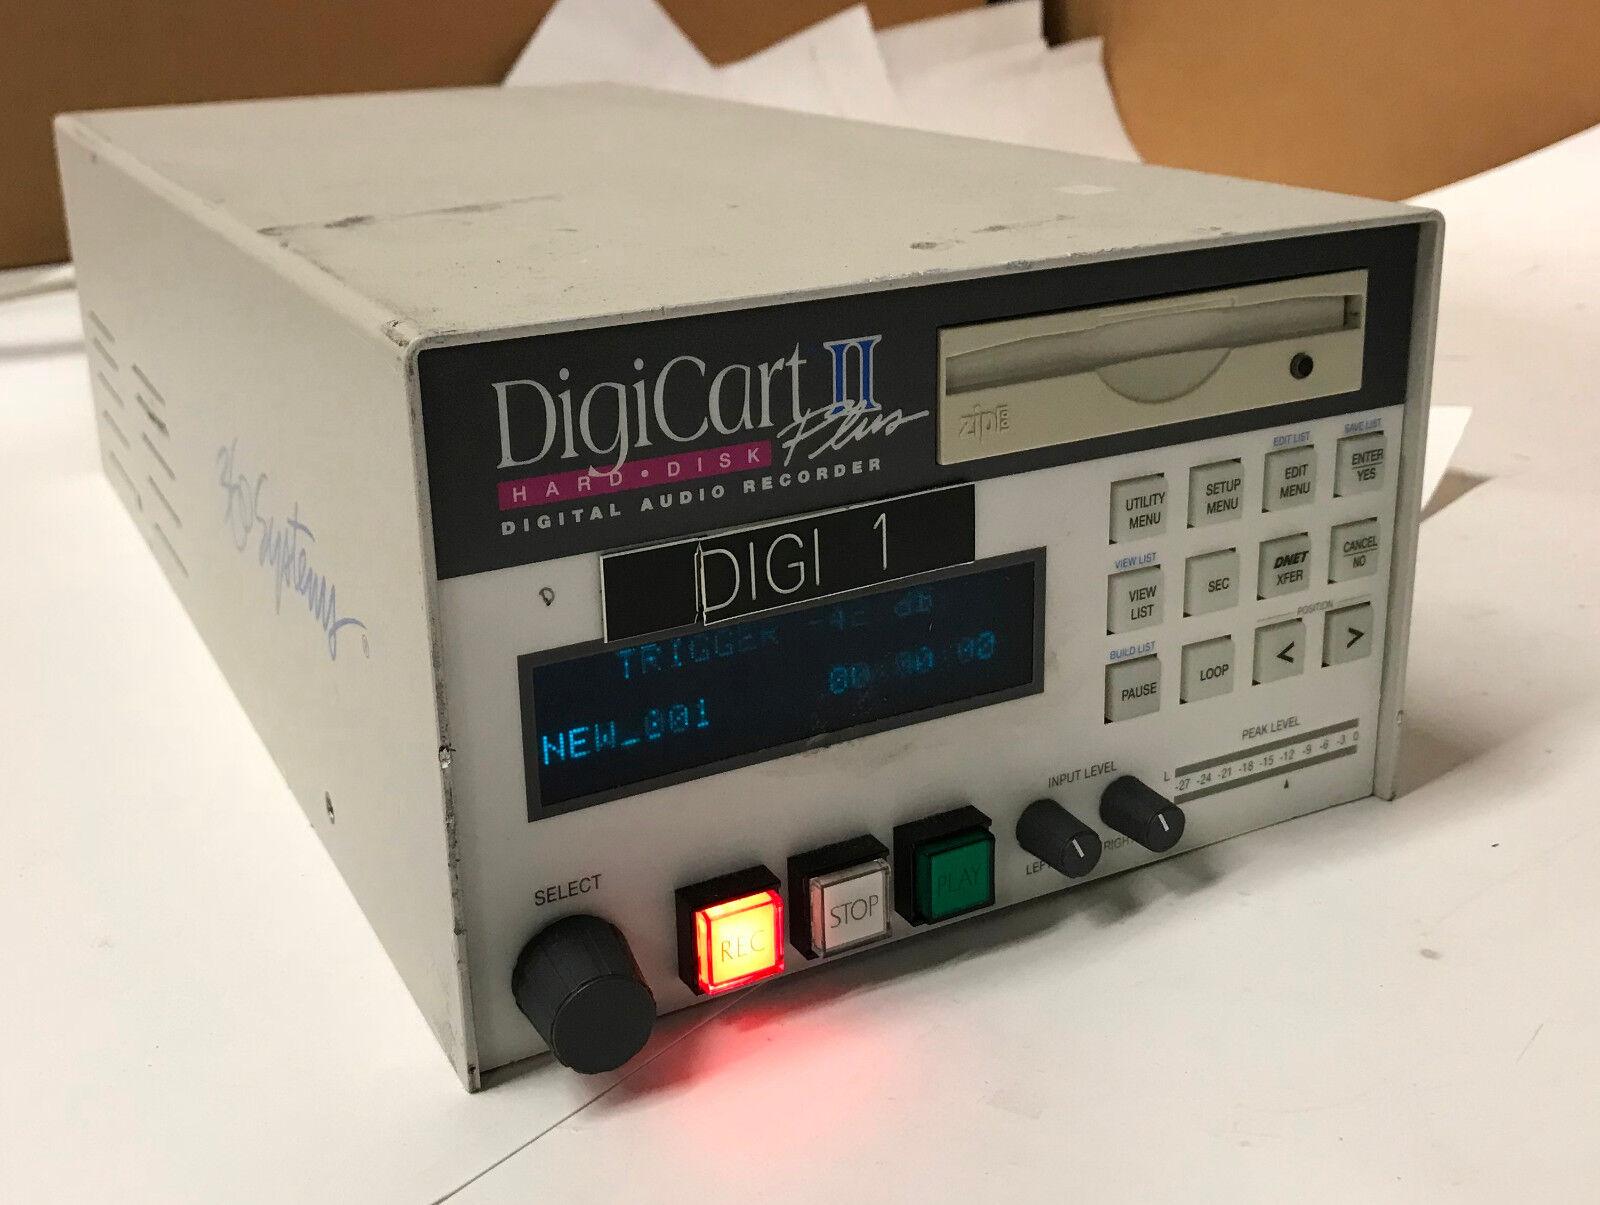 DigiCart II Model 2730 Digital Audio Recorder 360Systems